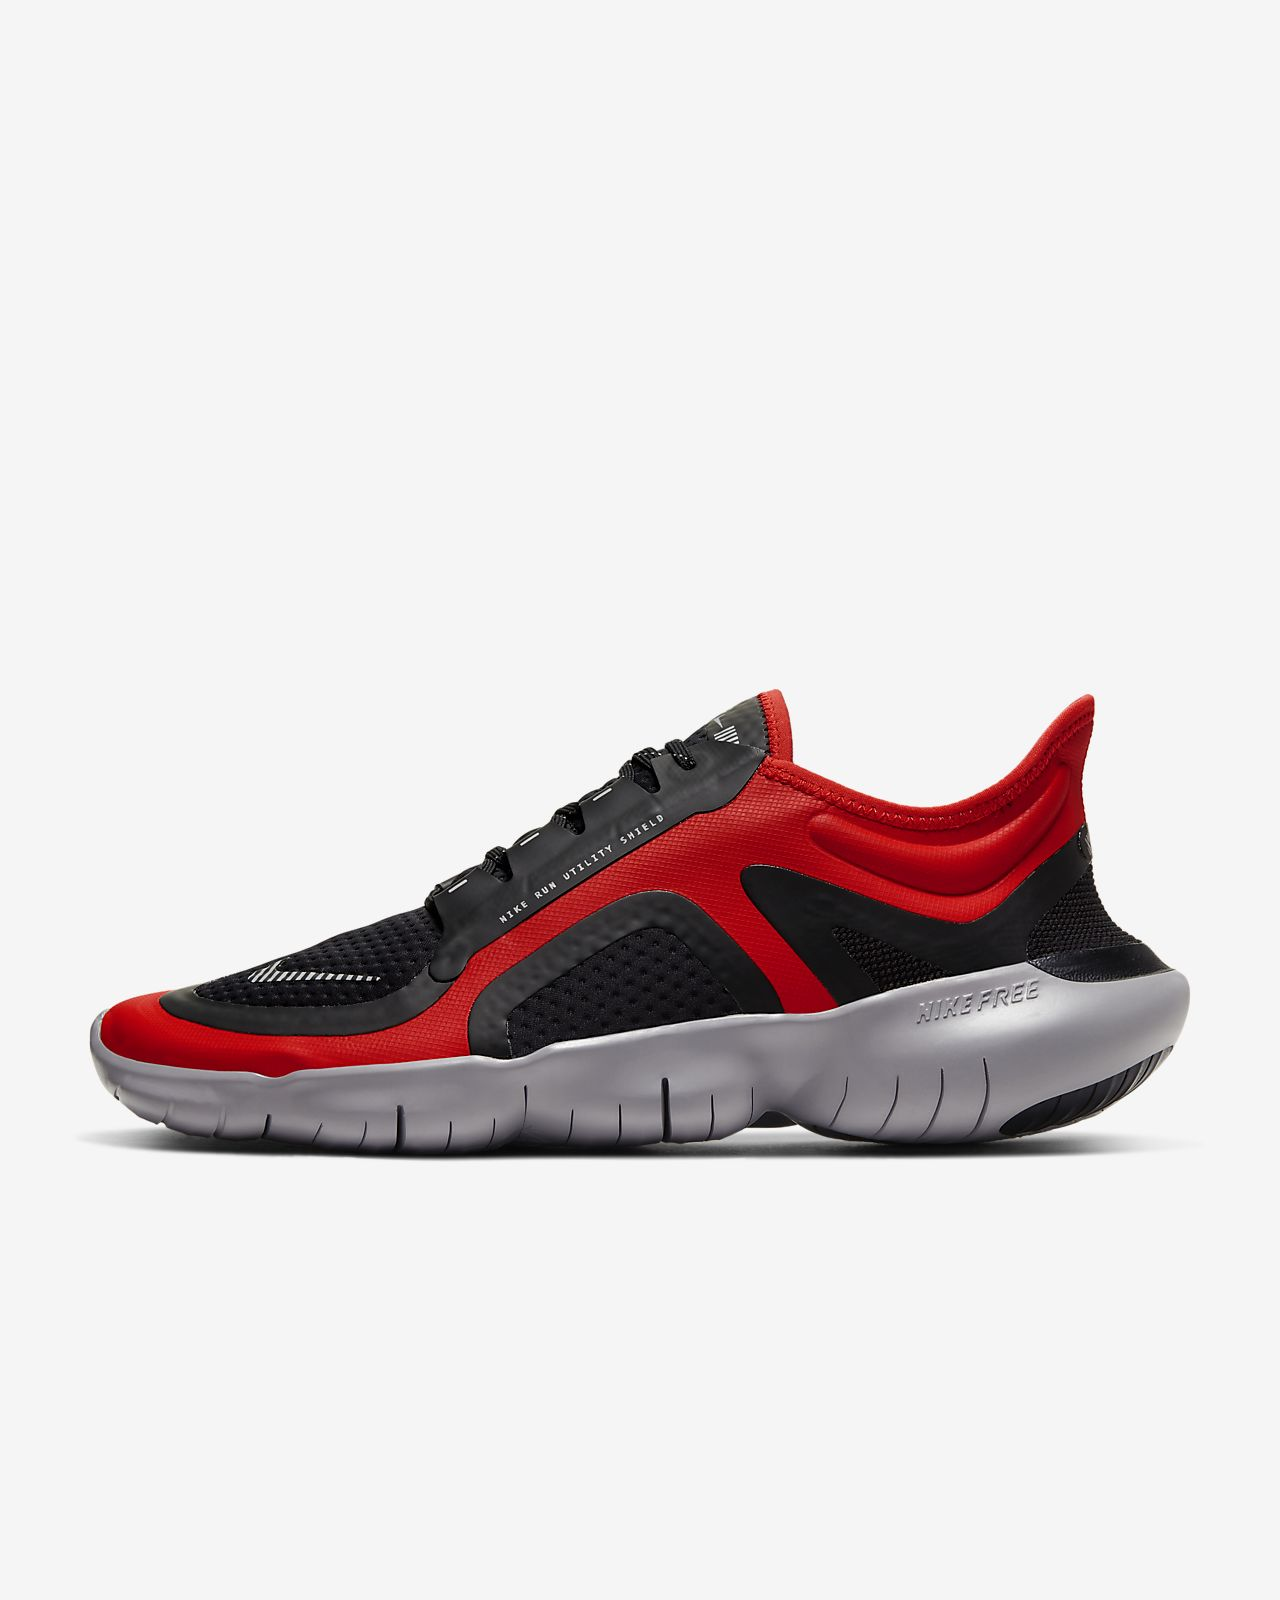 Nike Free RN 5.0 Shield Men's Running Shoe